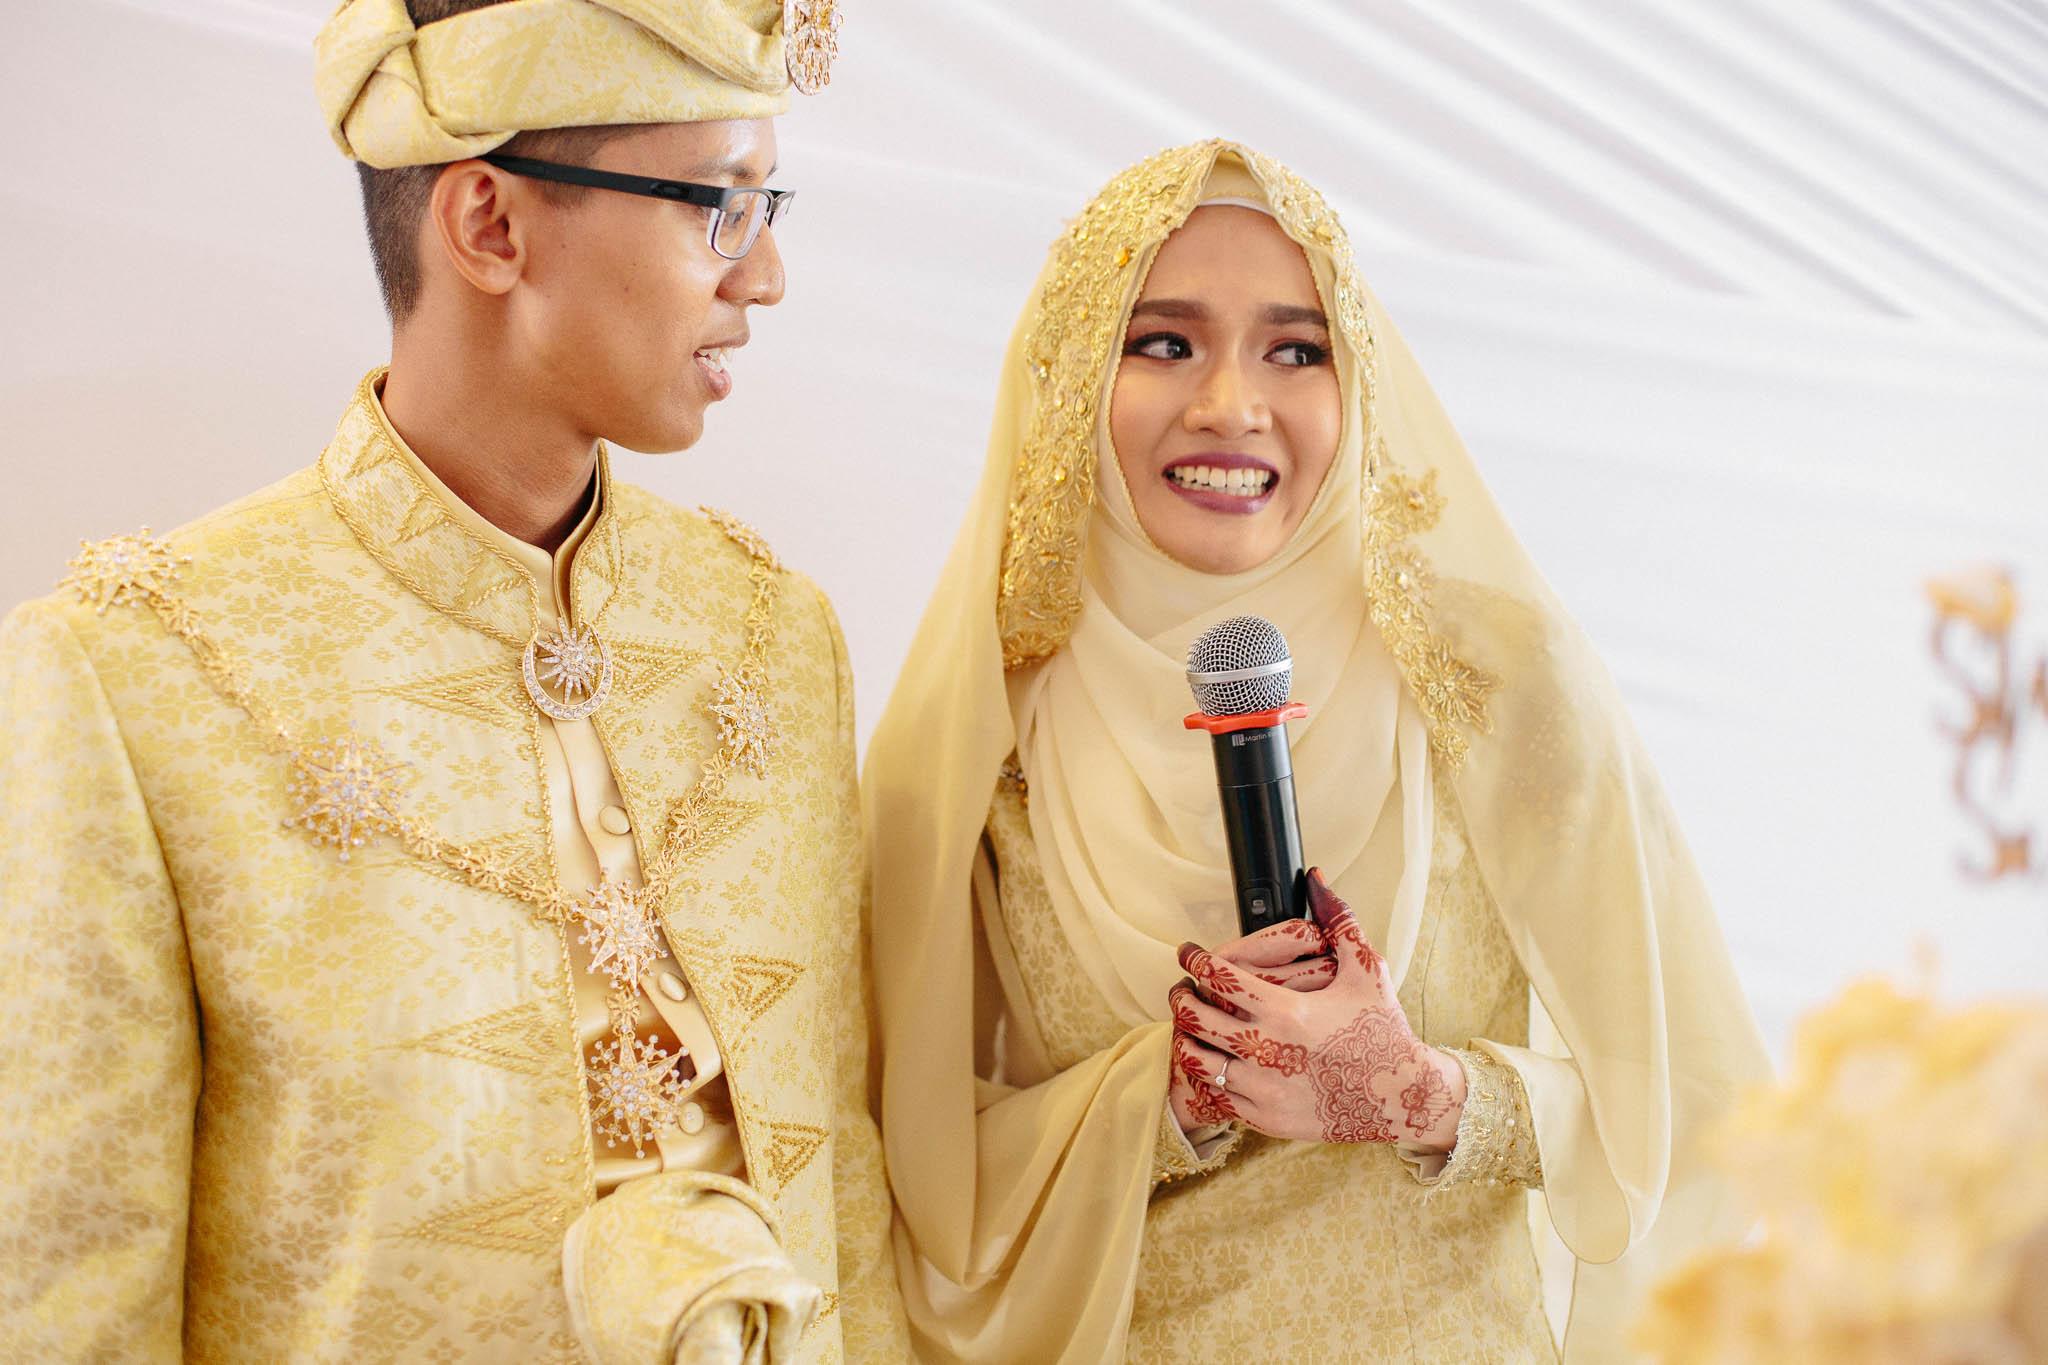 singapore-wedding-photographer-sharalyn-syazwan-044.jpg